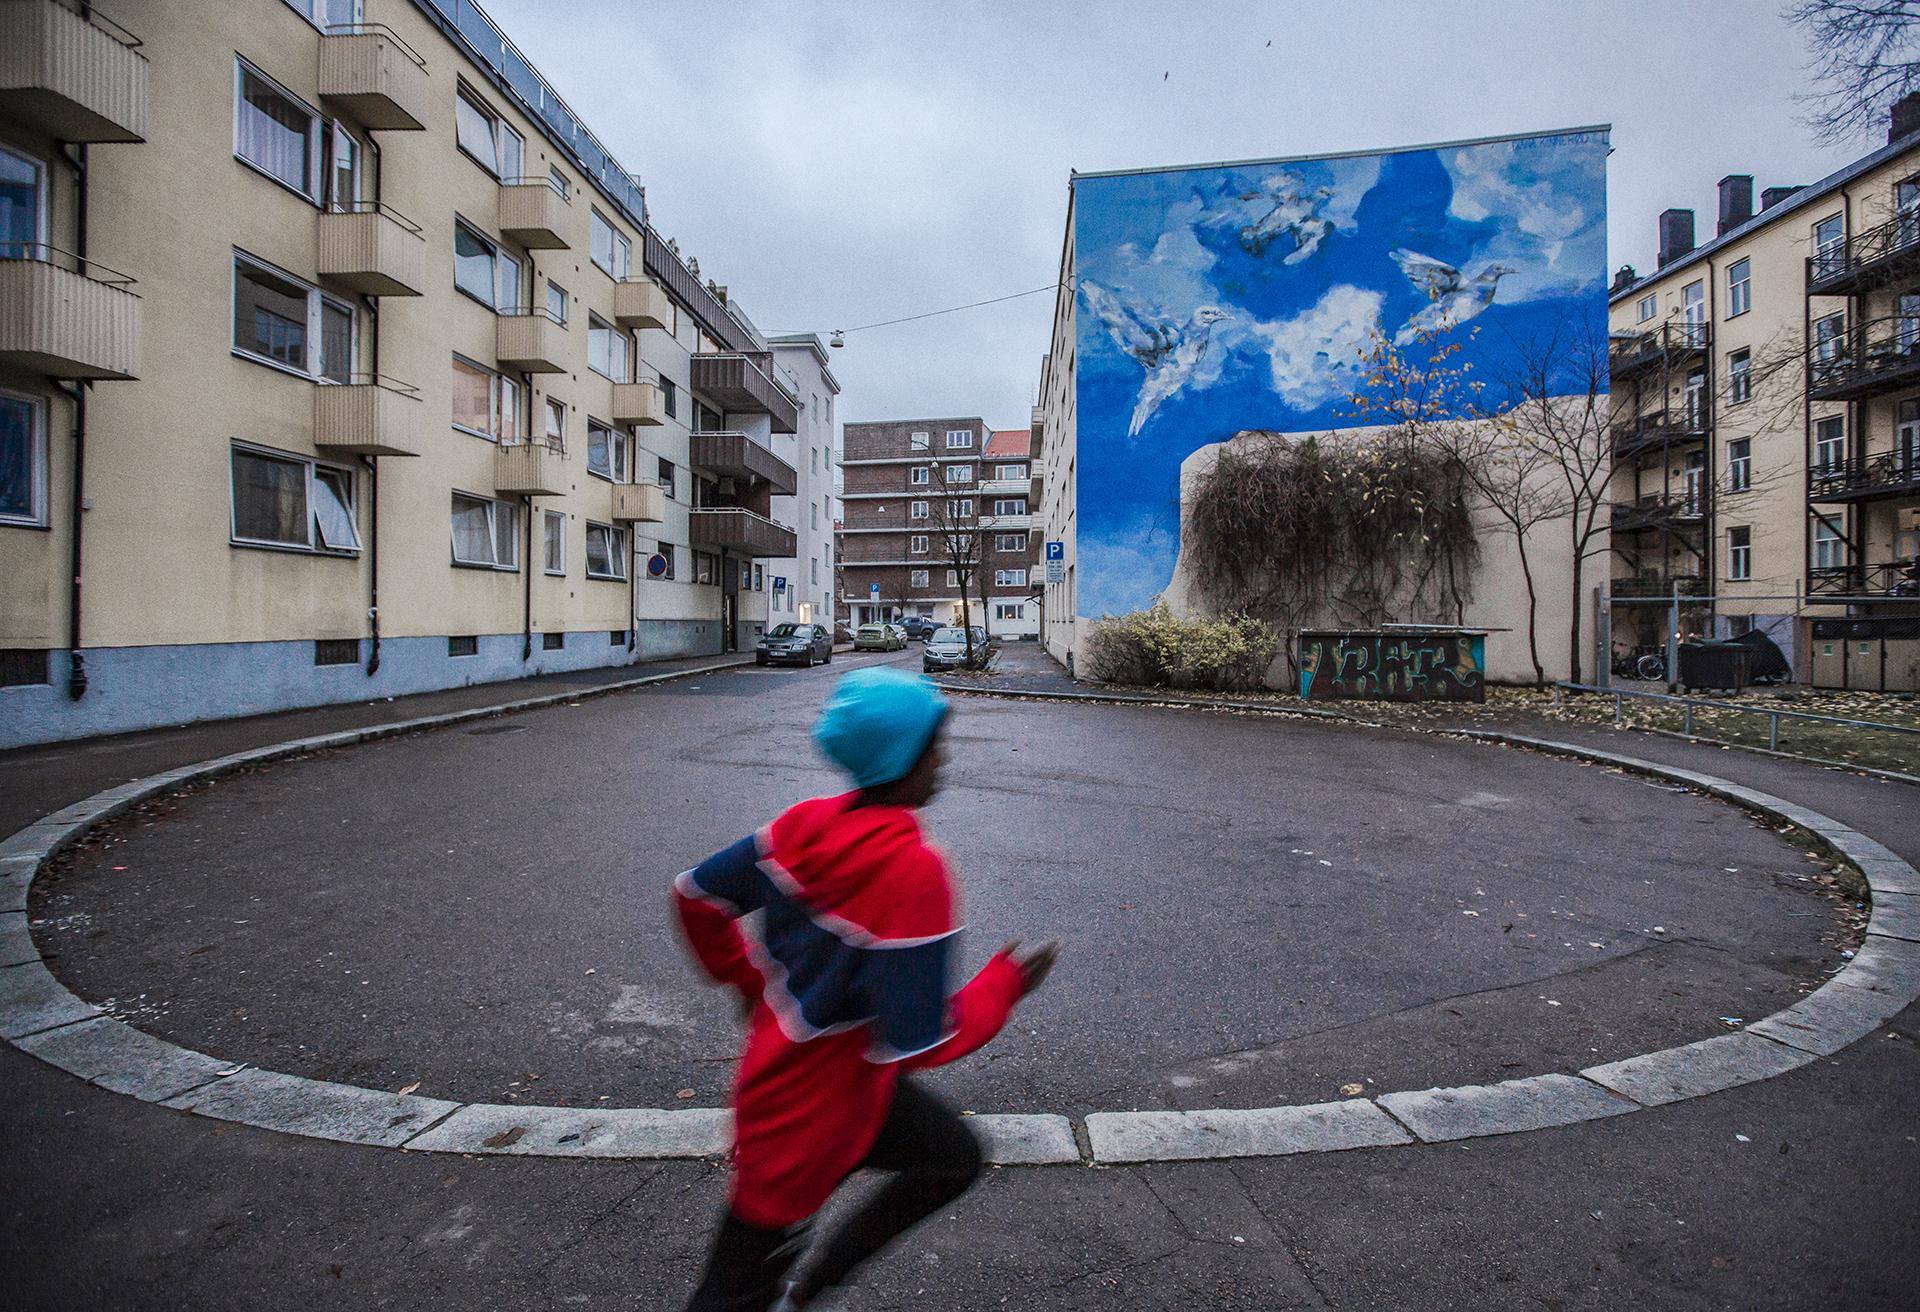 Töyen, Oslo, Norway, urban, kids, black